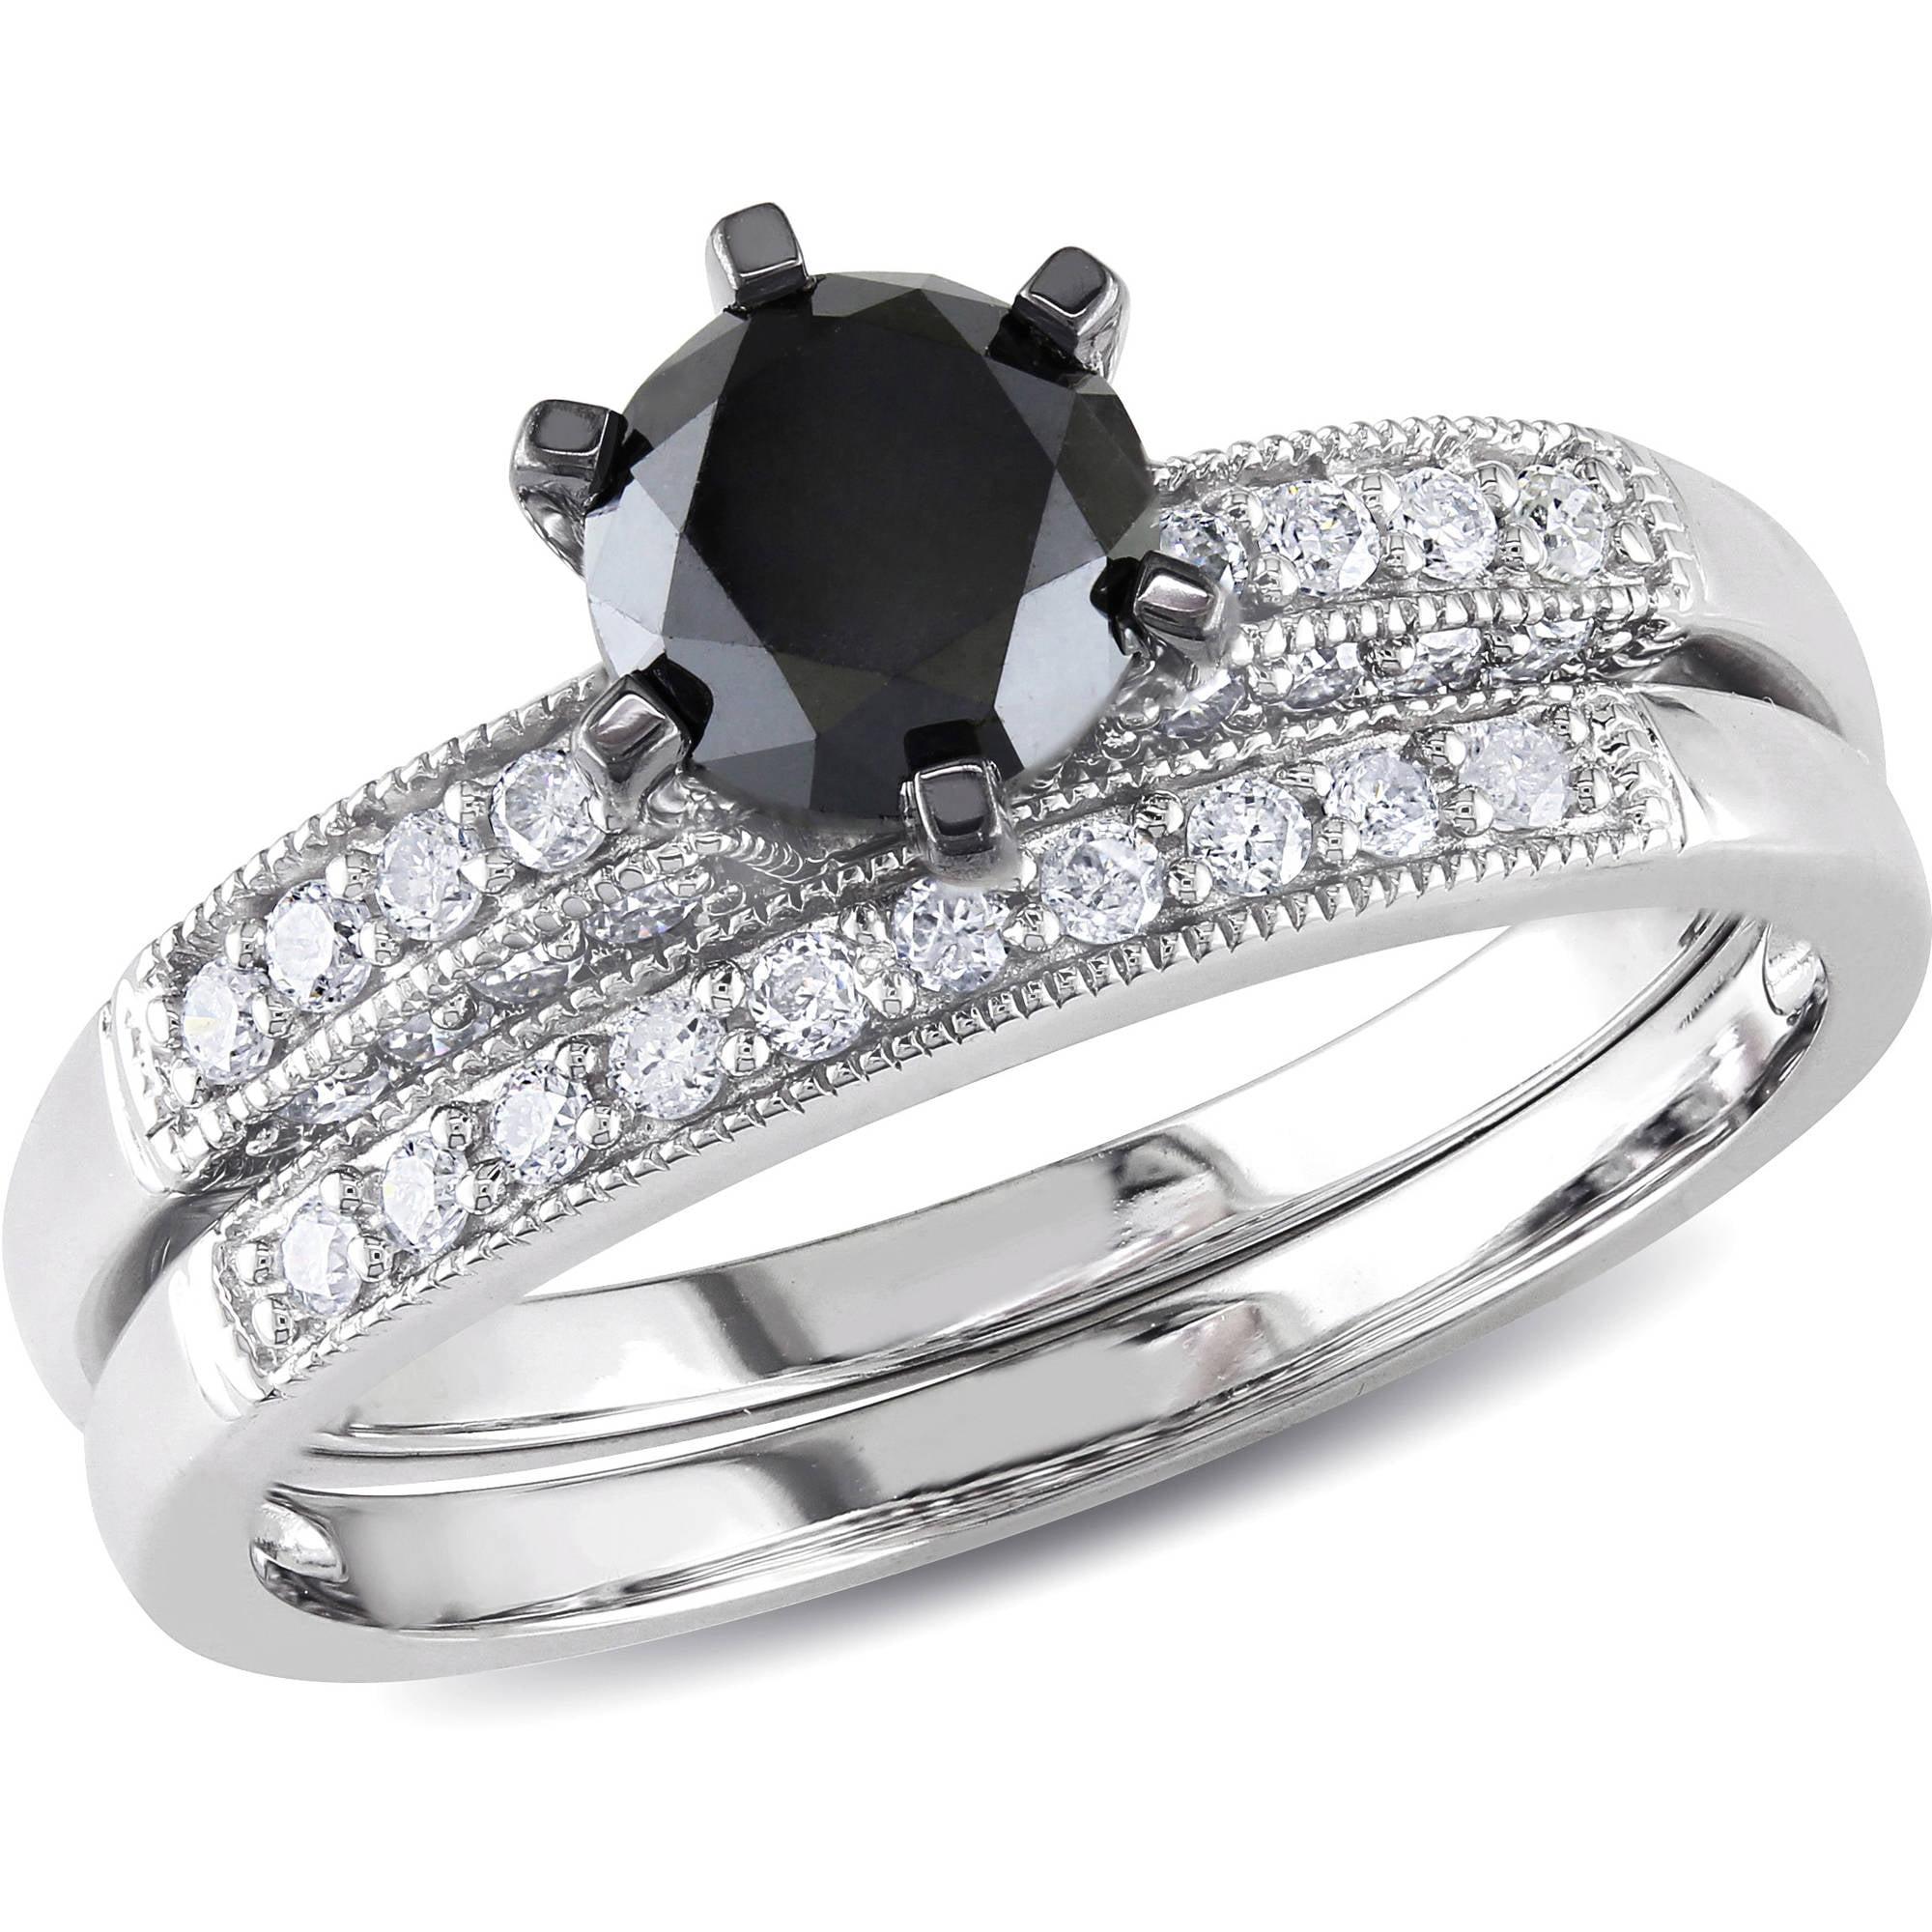 1-1/3 Carat T.W. Black and White Diamond 10kt White Gold Bridal Set